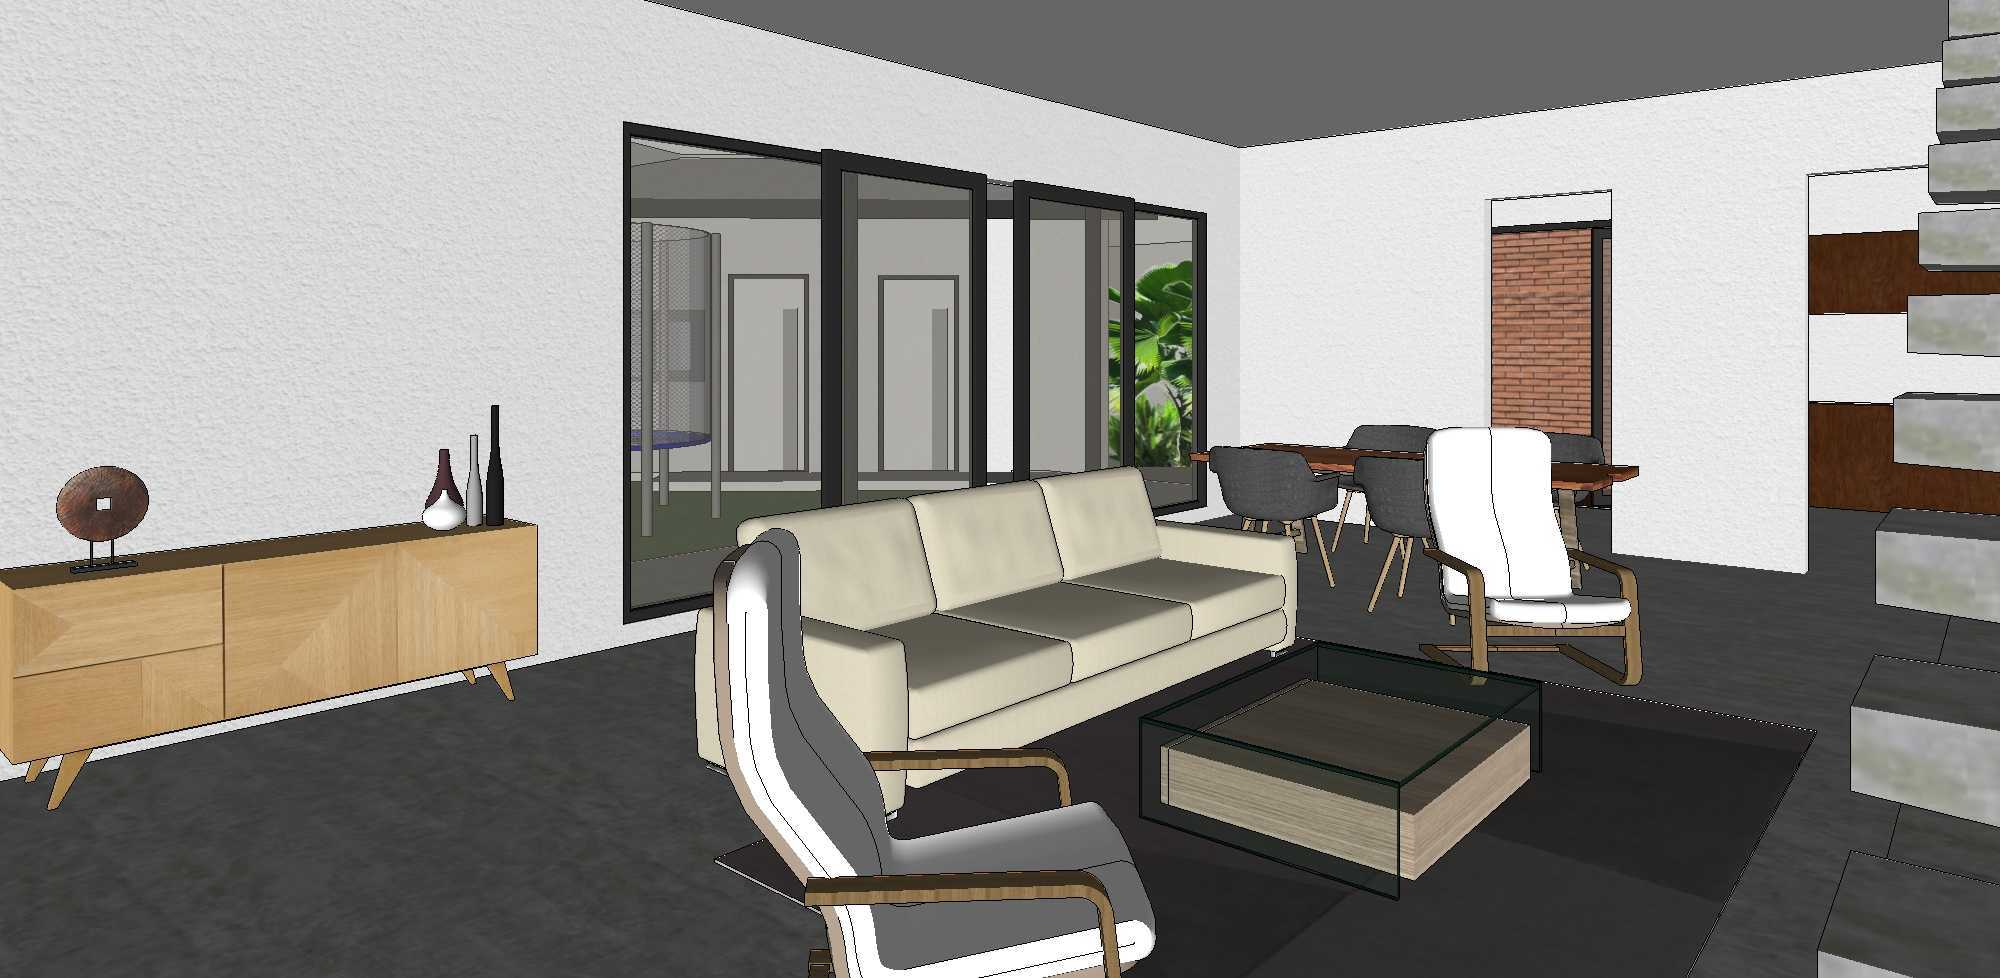 Zigzag Architecture Studio I House - Serpong Garden Cisauk, Tangerang, Banten, Indonesia Cisauk, Tangerang, Banten, Indonesia Zigzag-Architecture-Studio-I-House-Serpong-Garden  56169